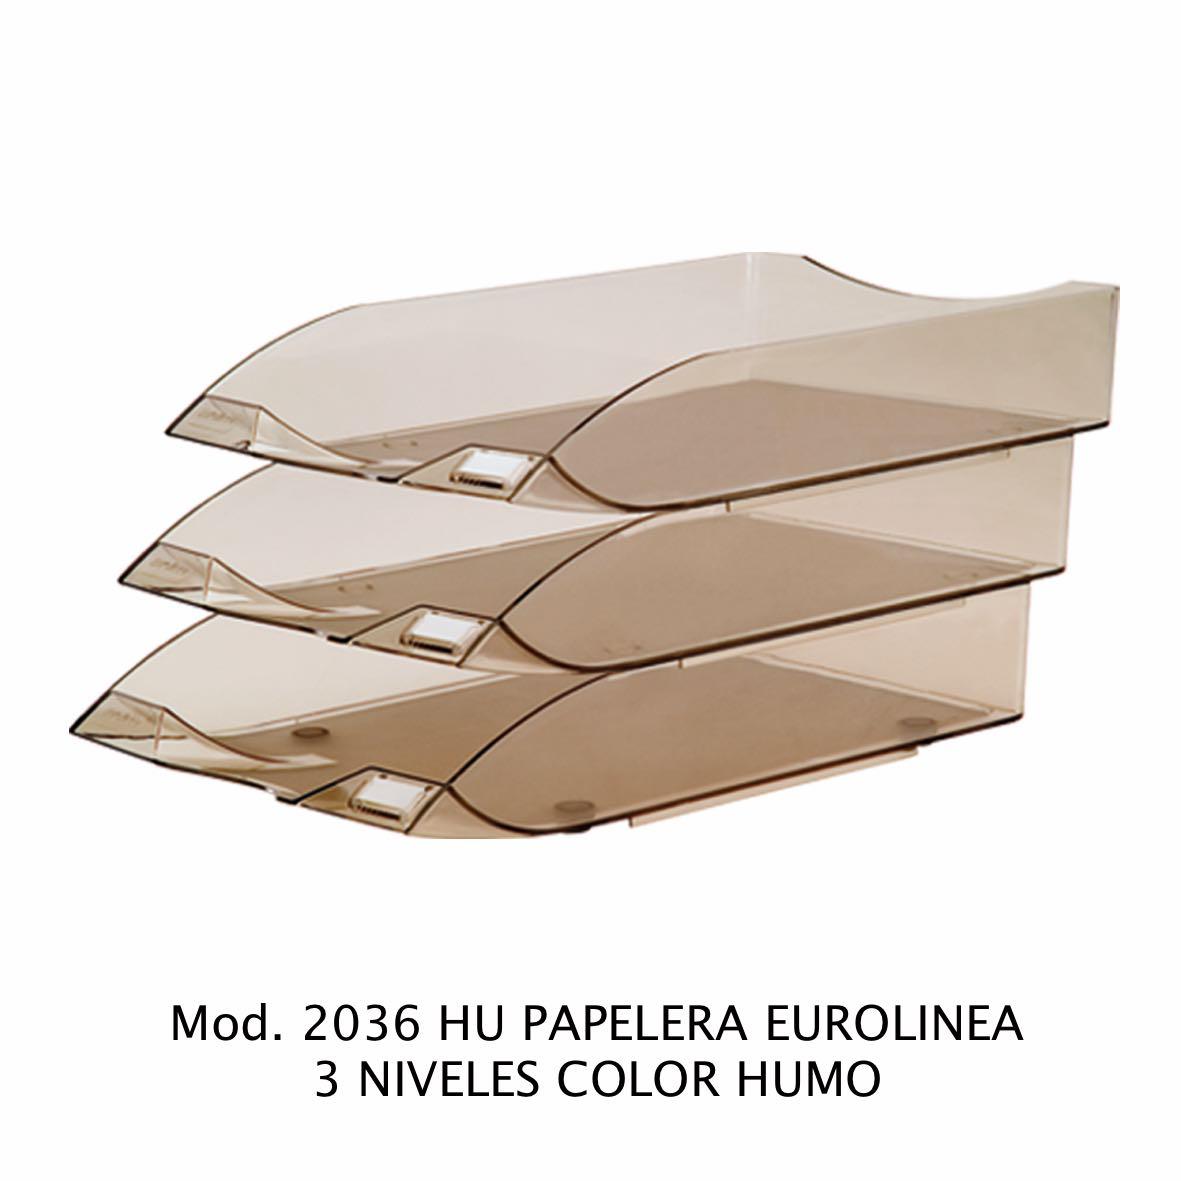 Charola de escritorio tamaño oficio de 3 niveles color humo Eurolínea Modelo 2036 HU - Sablón